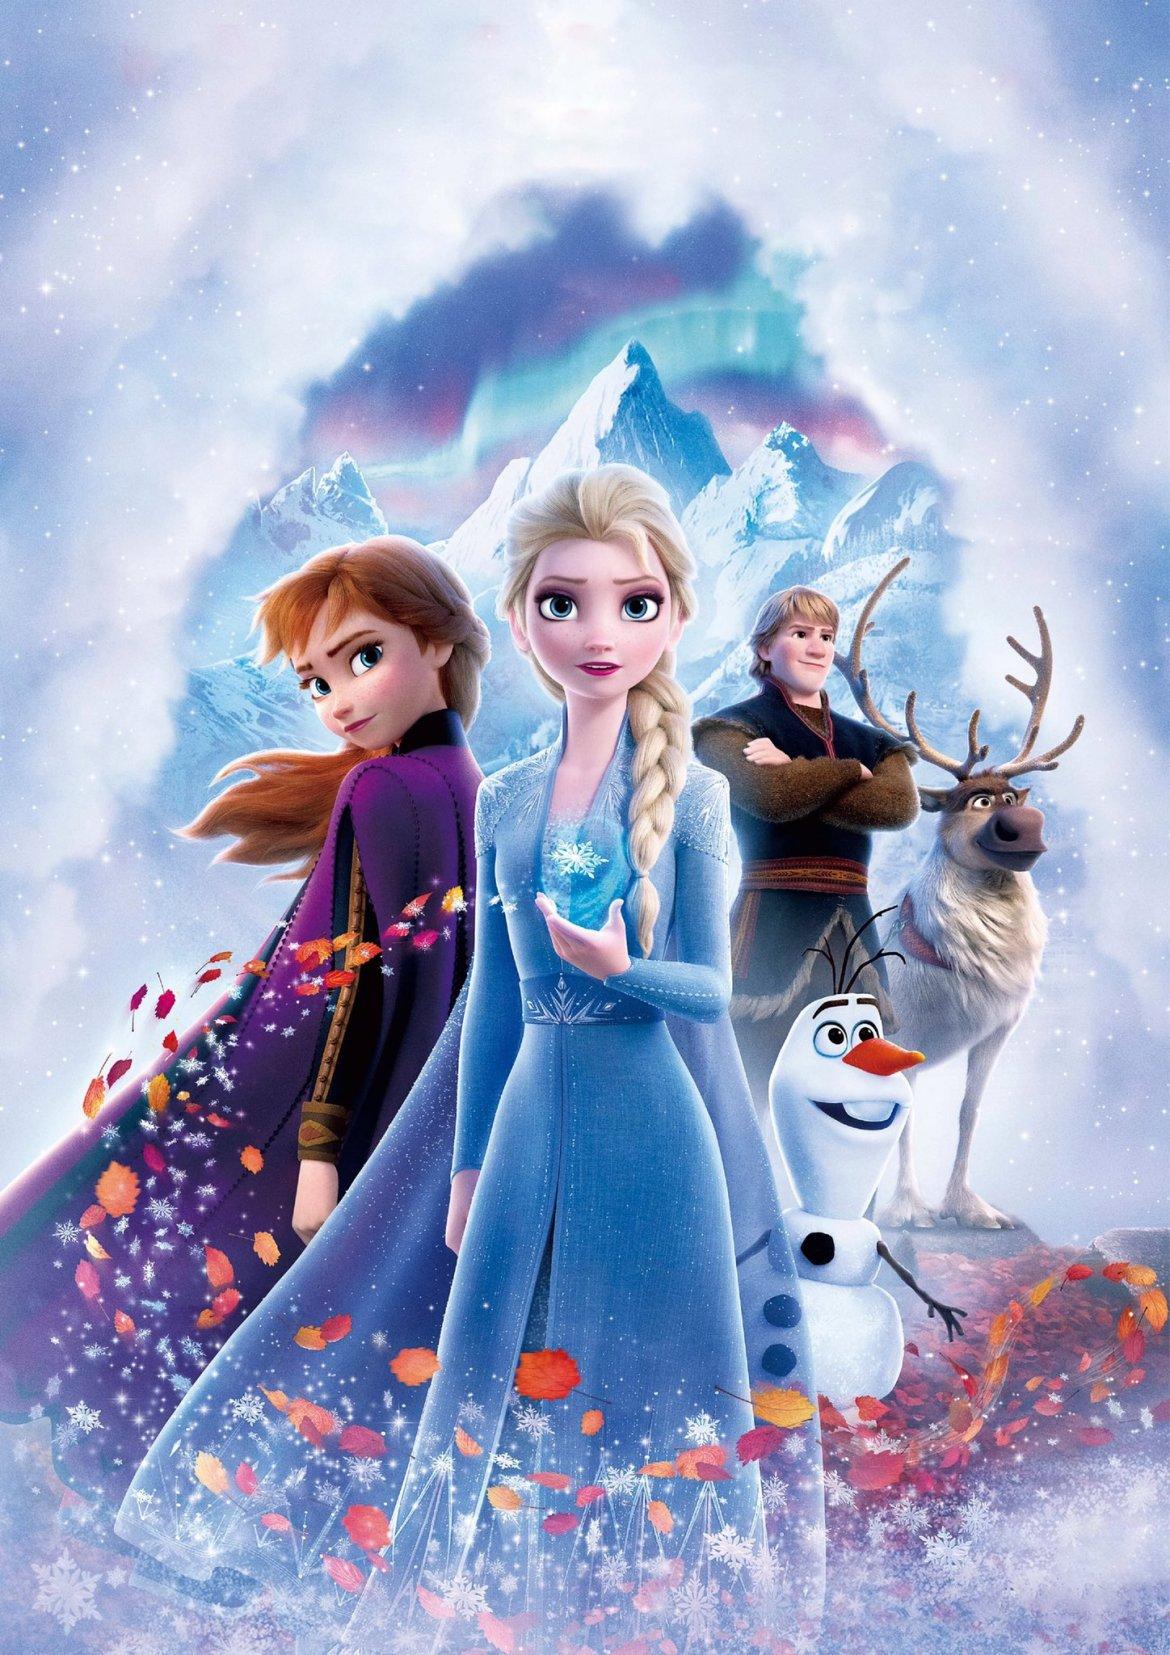 Frozen 2 | Official Trailer | Disney